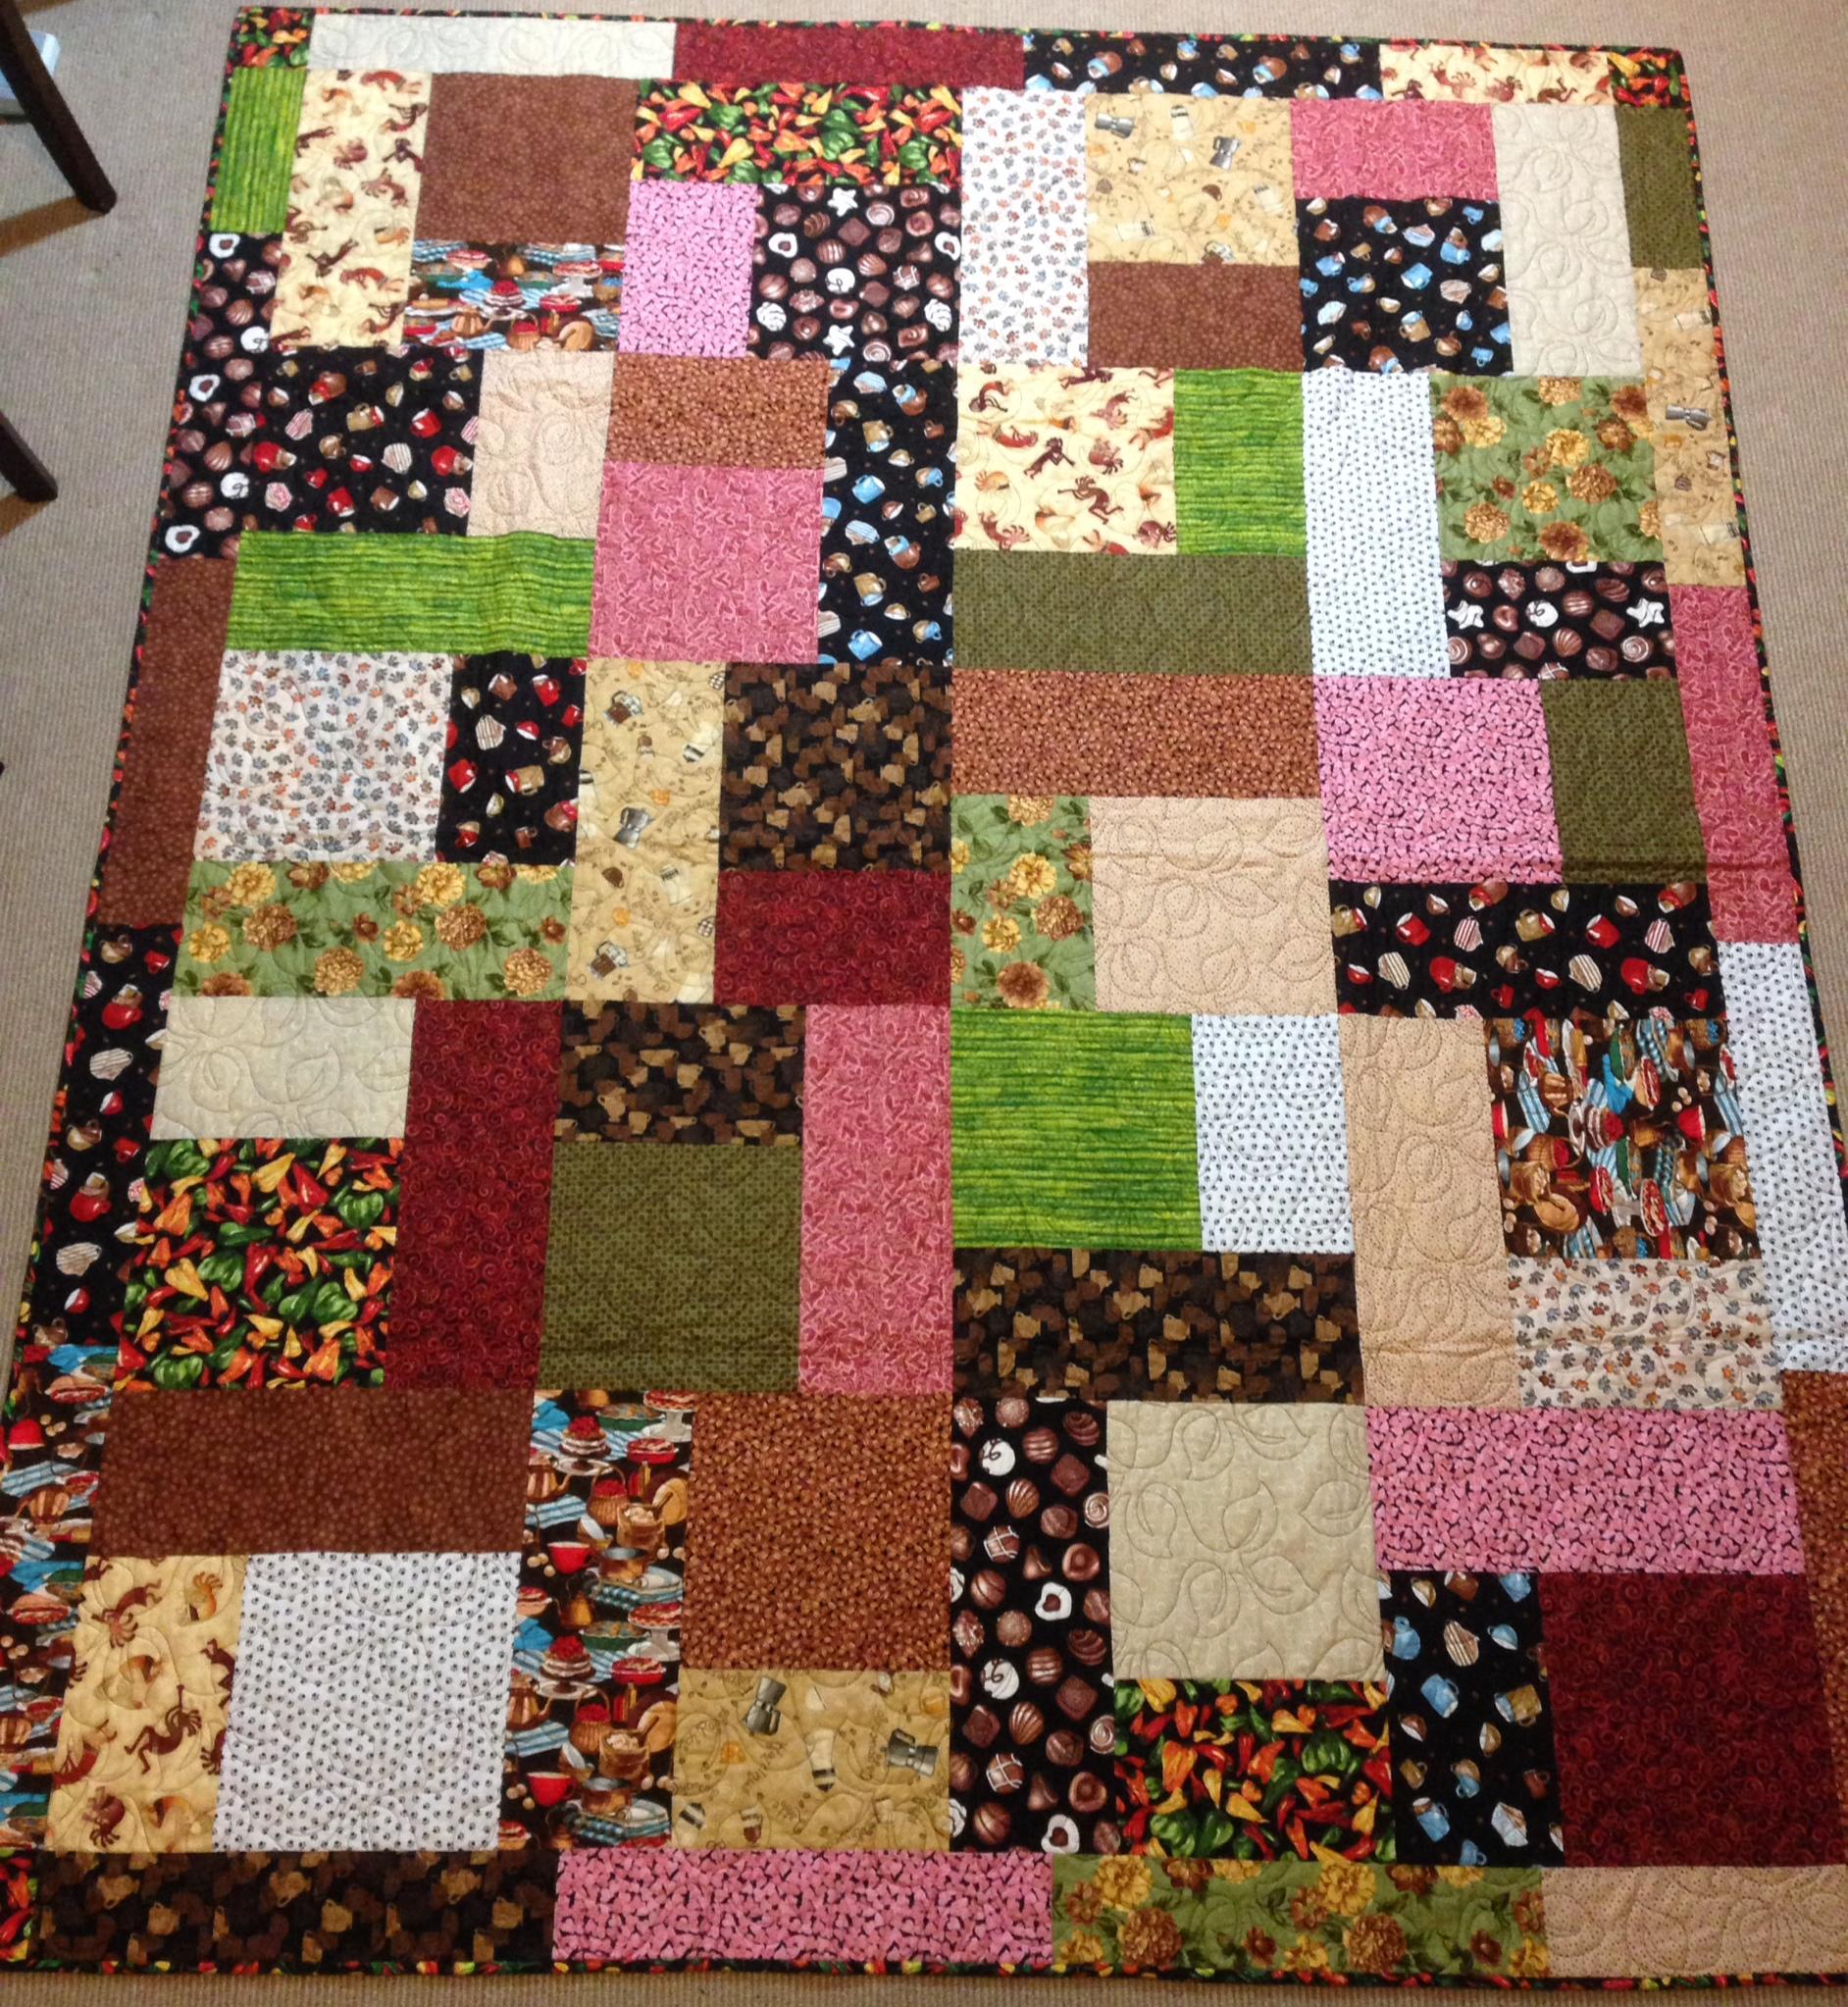 Monsters | Gorram Quilts : free turning twenty quilt pattern - Adamdwight.com